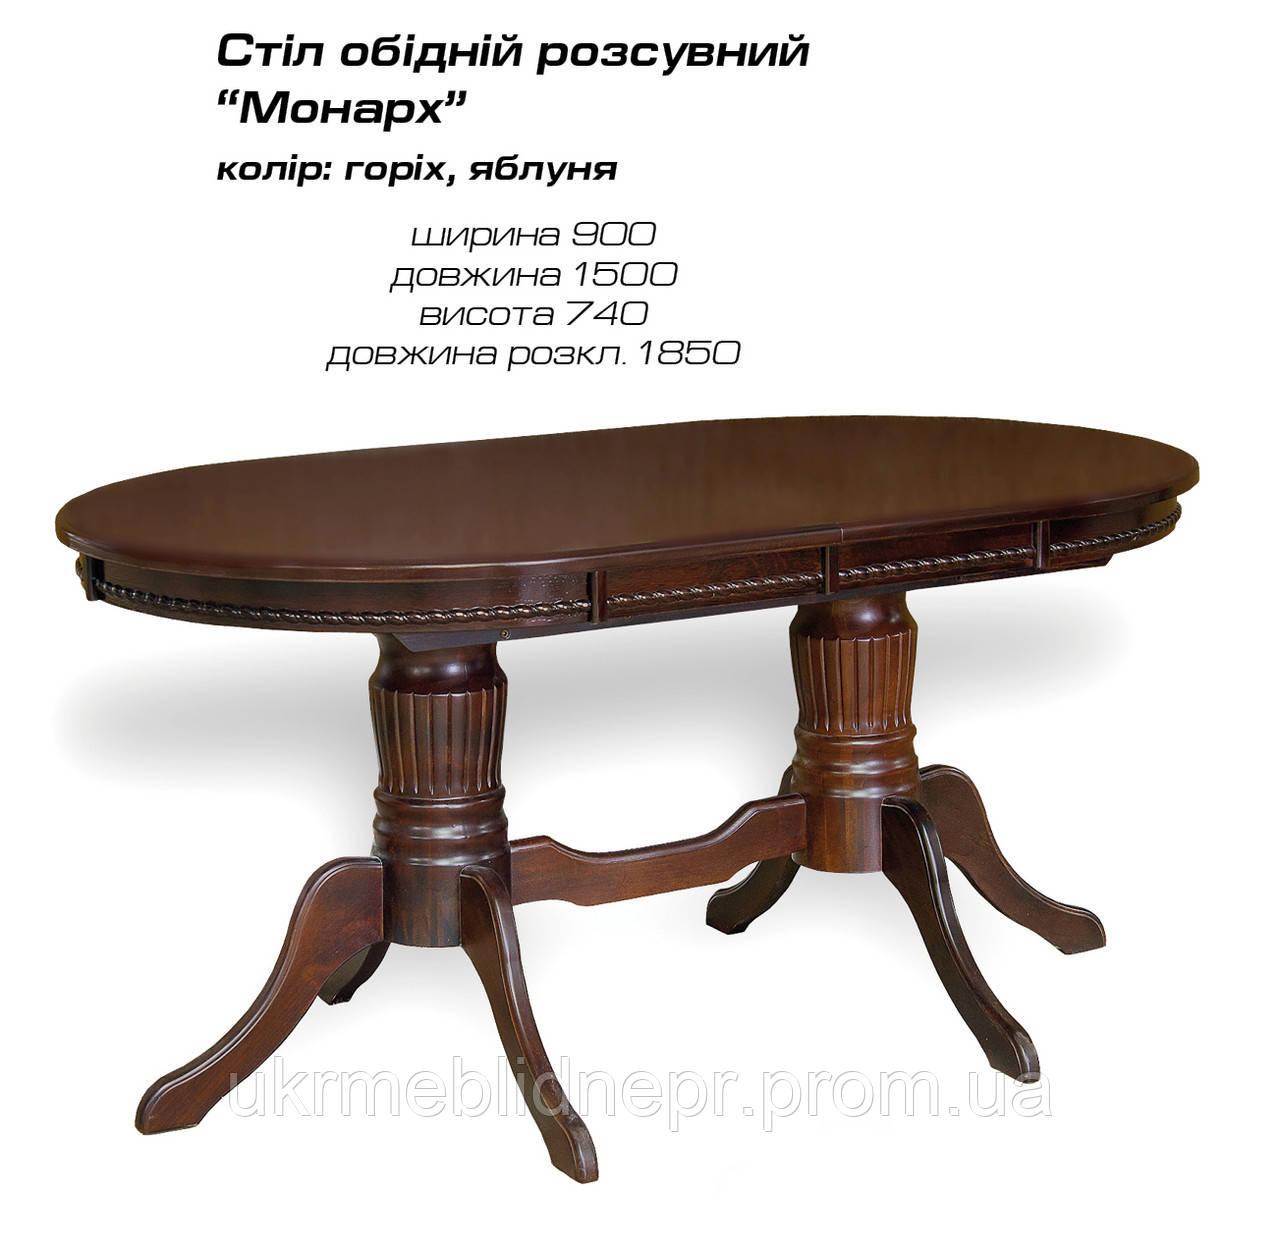 "Стол обеденный ""Монарх"", дерево"